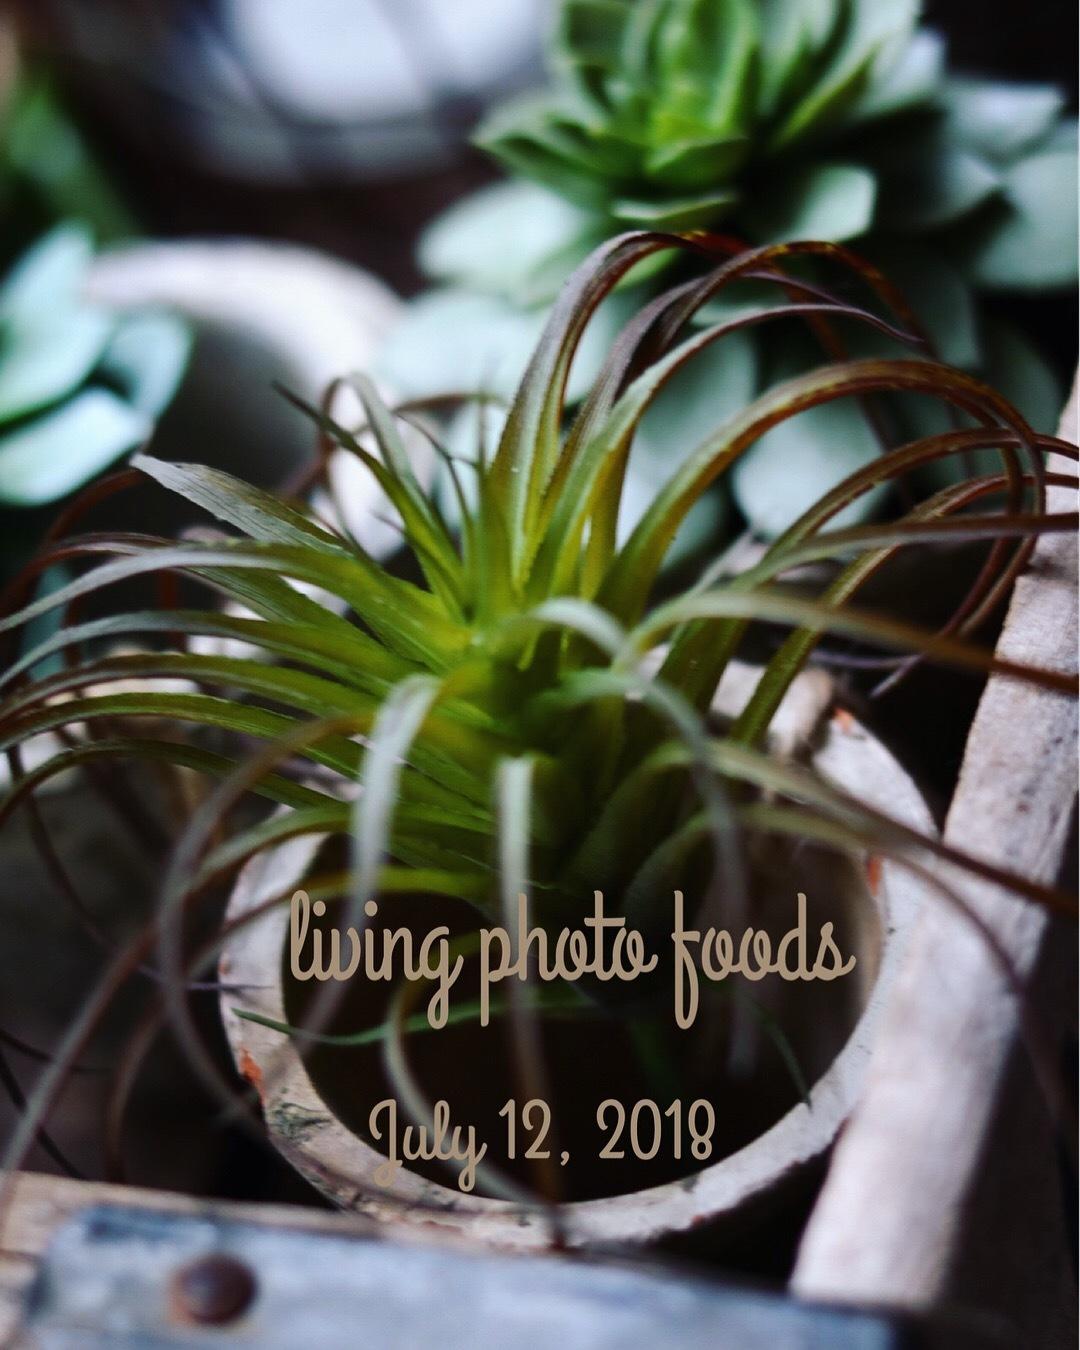 living photo foods 教室第5回目_c0366722_17500395.jpeg